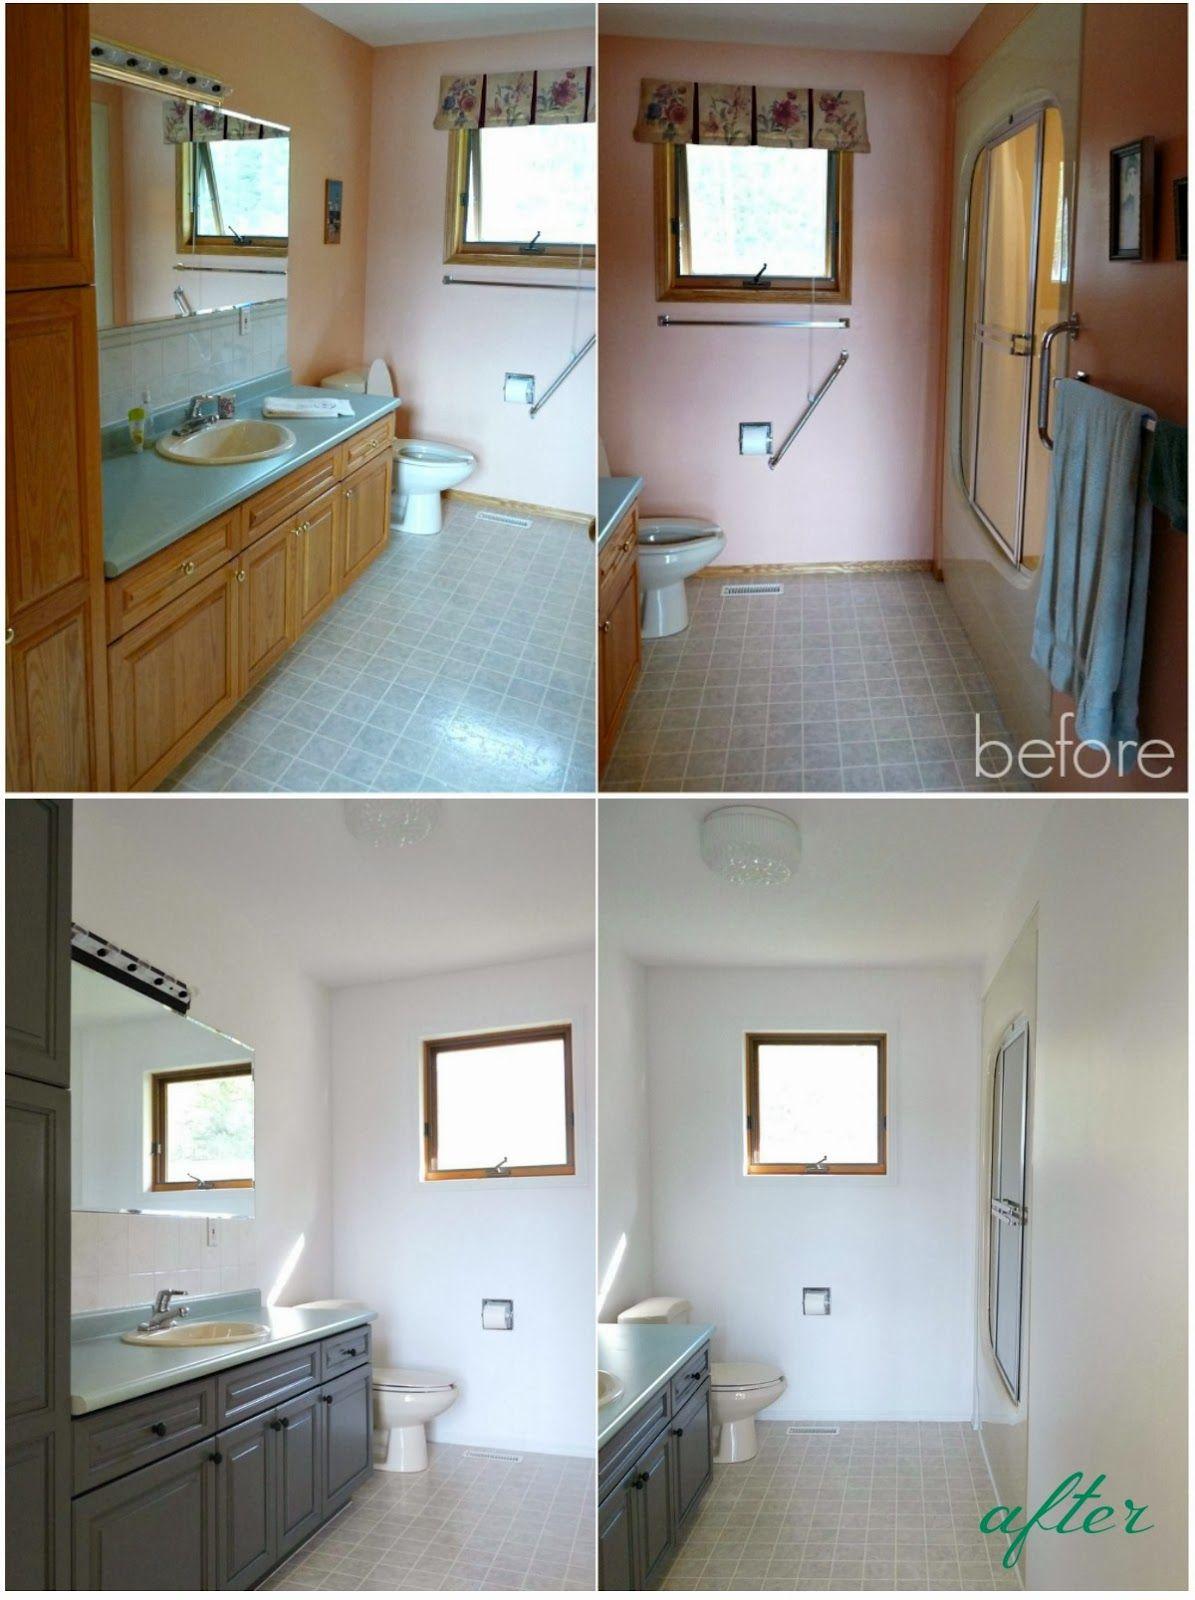 Bathroom Before After Bathrooms Remodel Diy Bathroom Remodel Bathroom Remodel Master